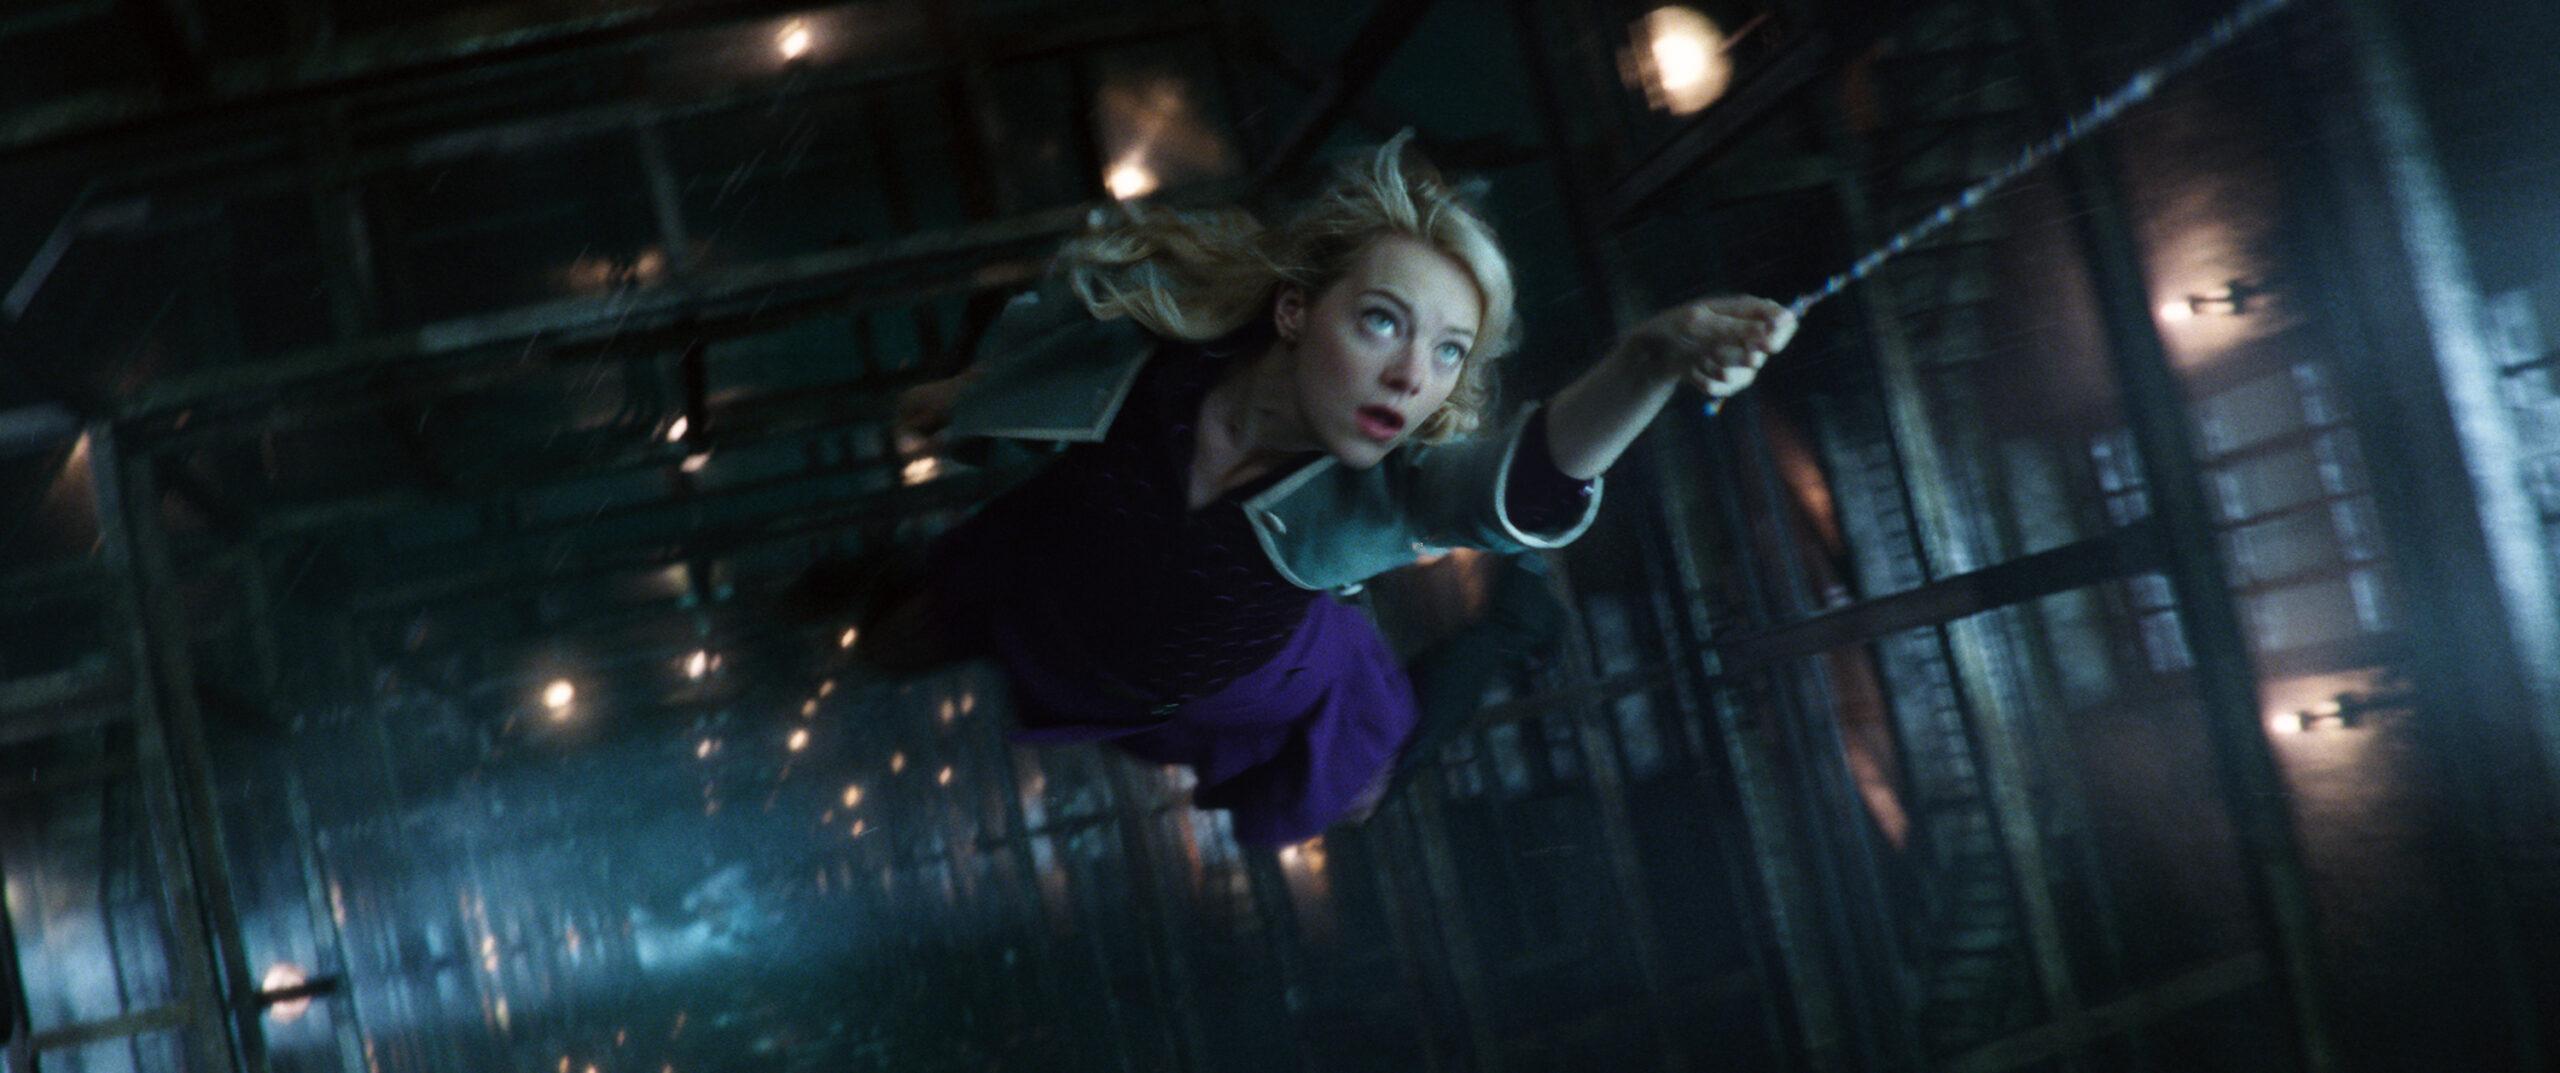 Emma Stone Is Returning In Spider-Man 3